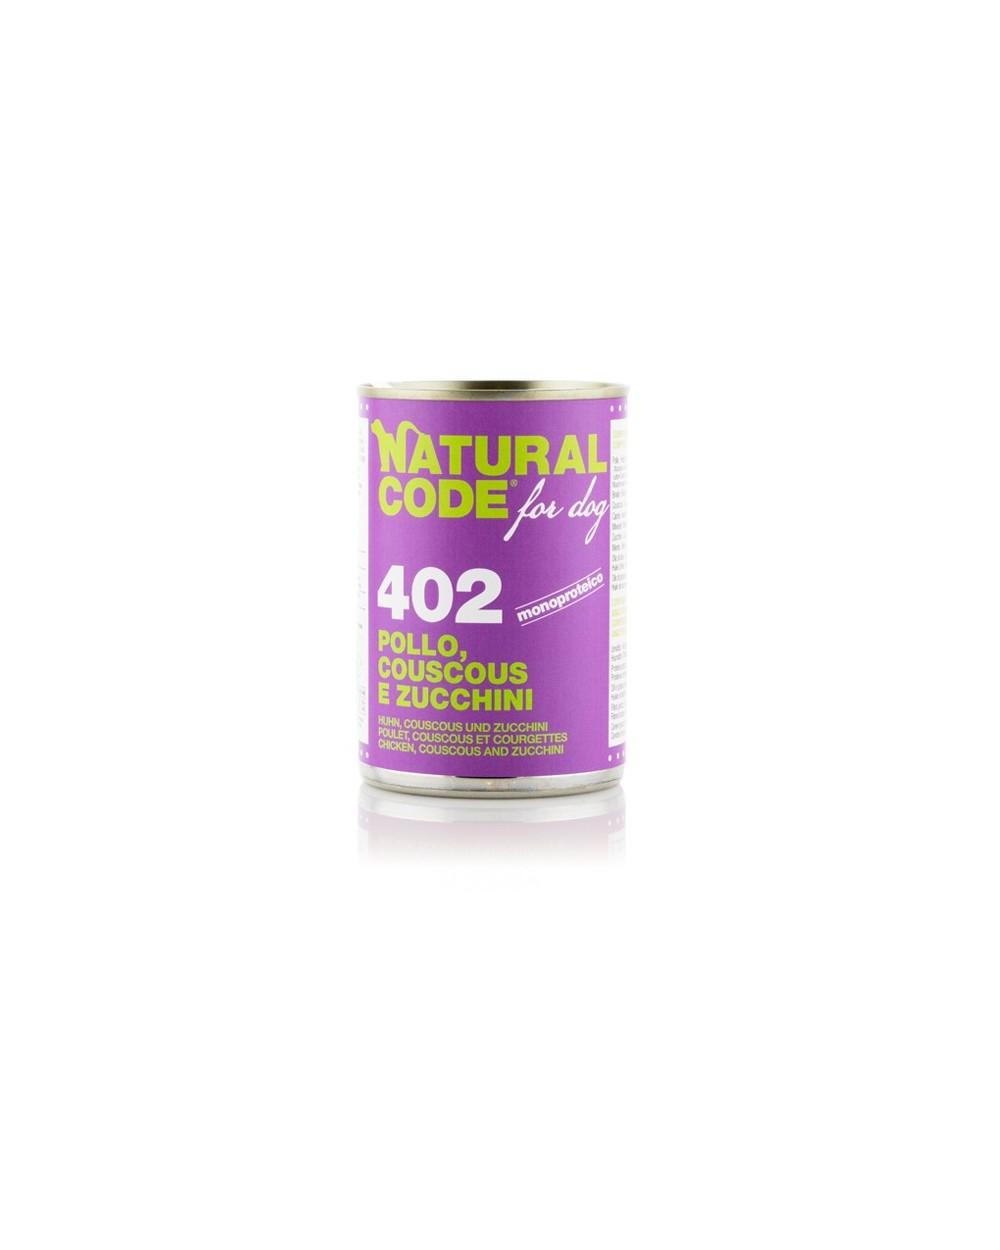 Natural Code Patè 402 Pollo Couscous e Zucchine